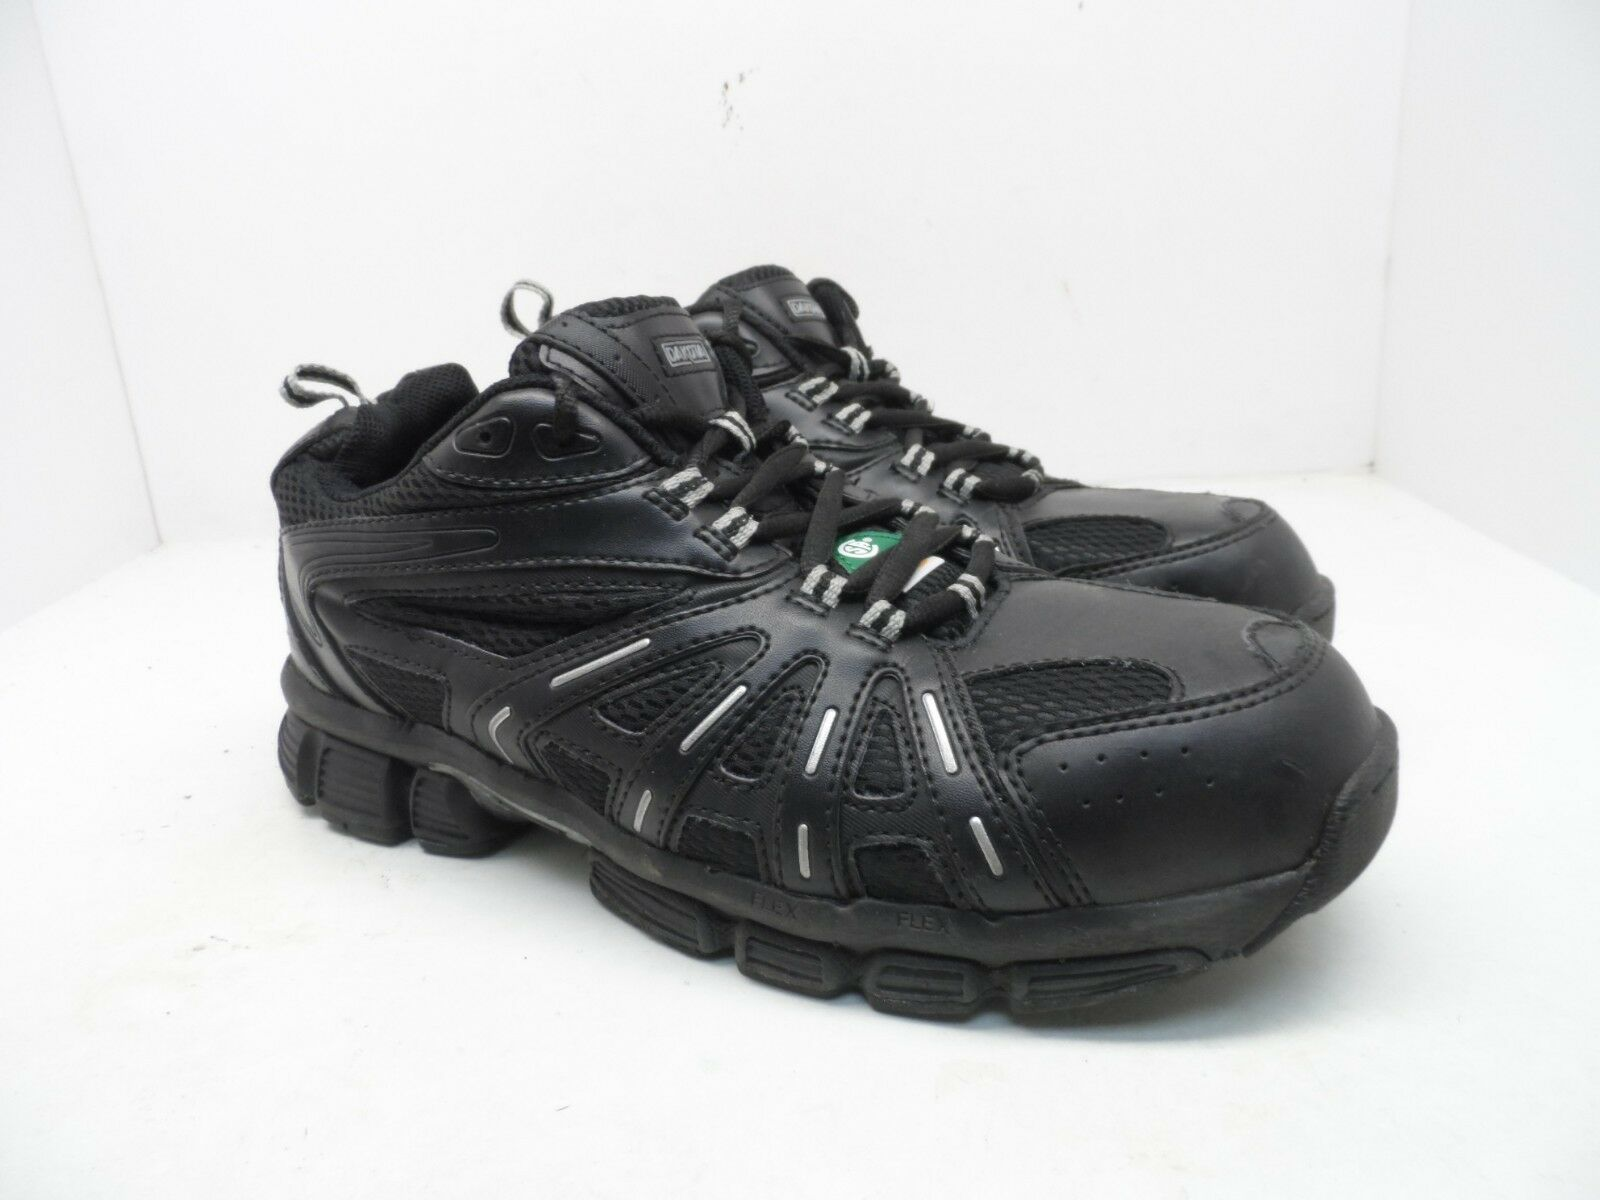 DAKOTA Men's Low-Cut Aluminium Toe Composite Plate Work shoes Black Size 10EE